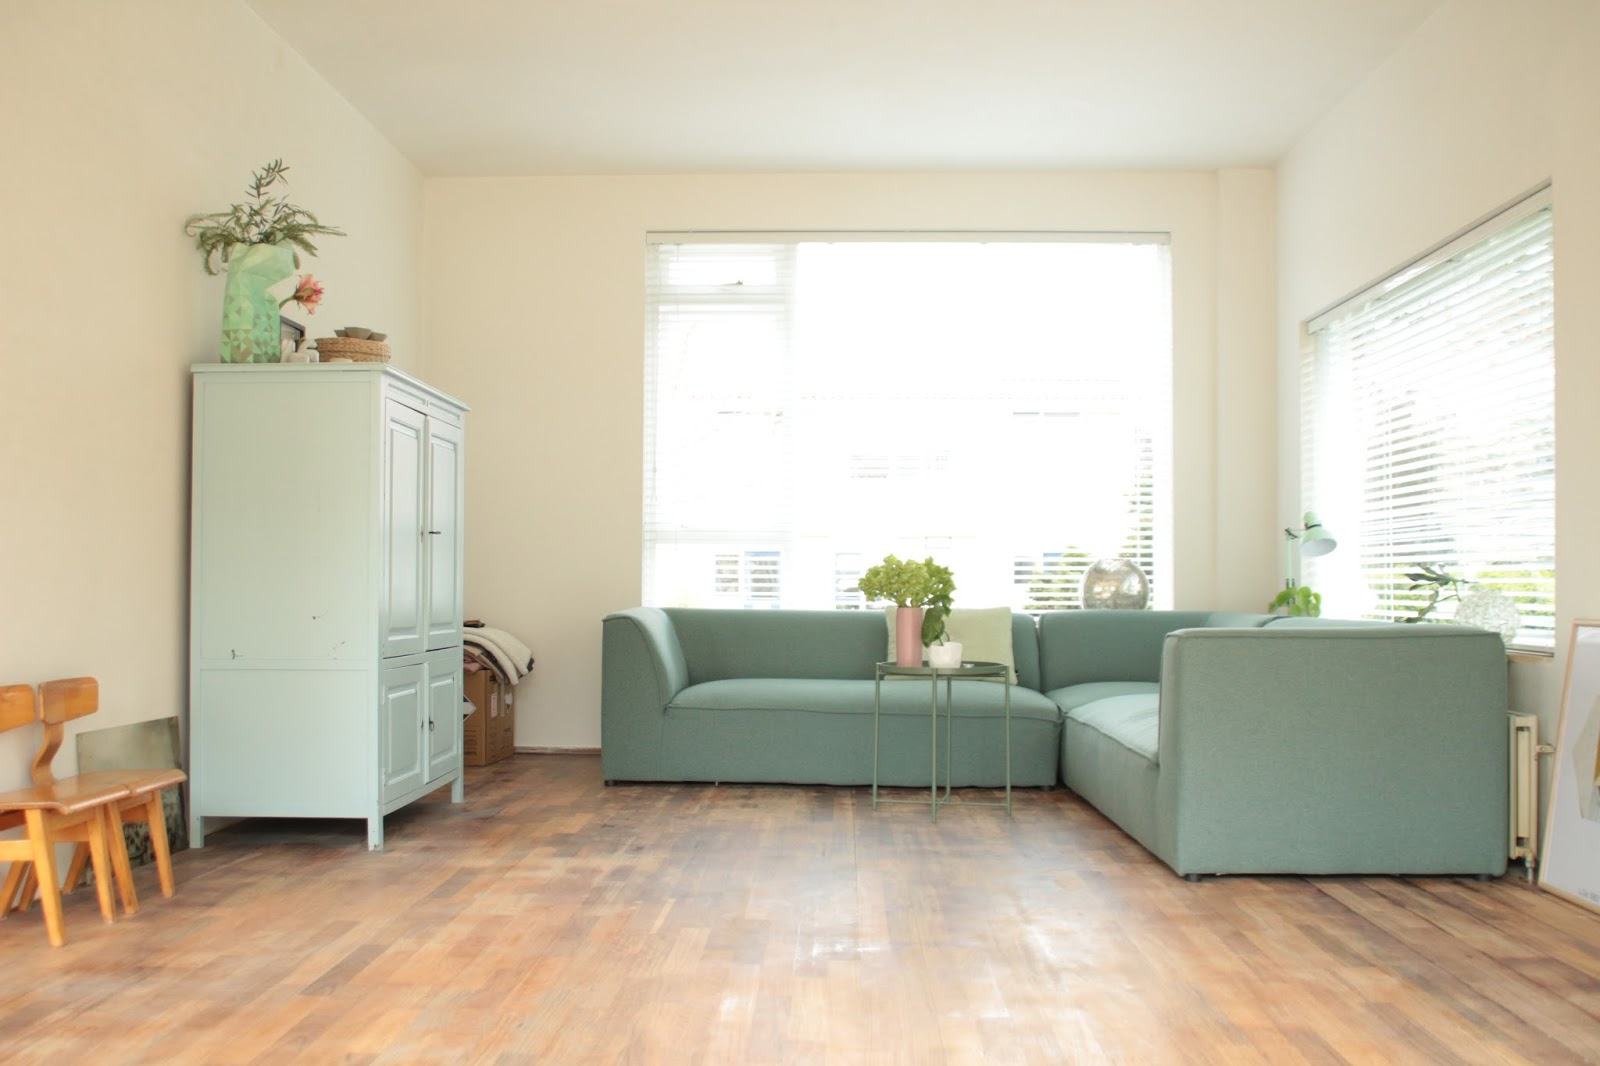 Houten vloer grijs schilderen annie sloan chalkpaint nederlands